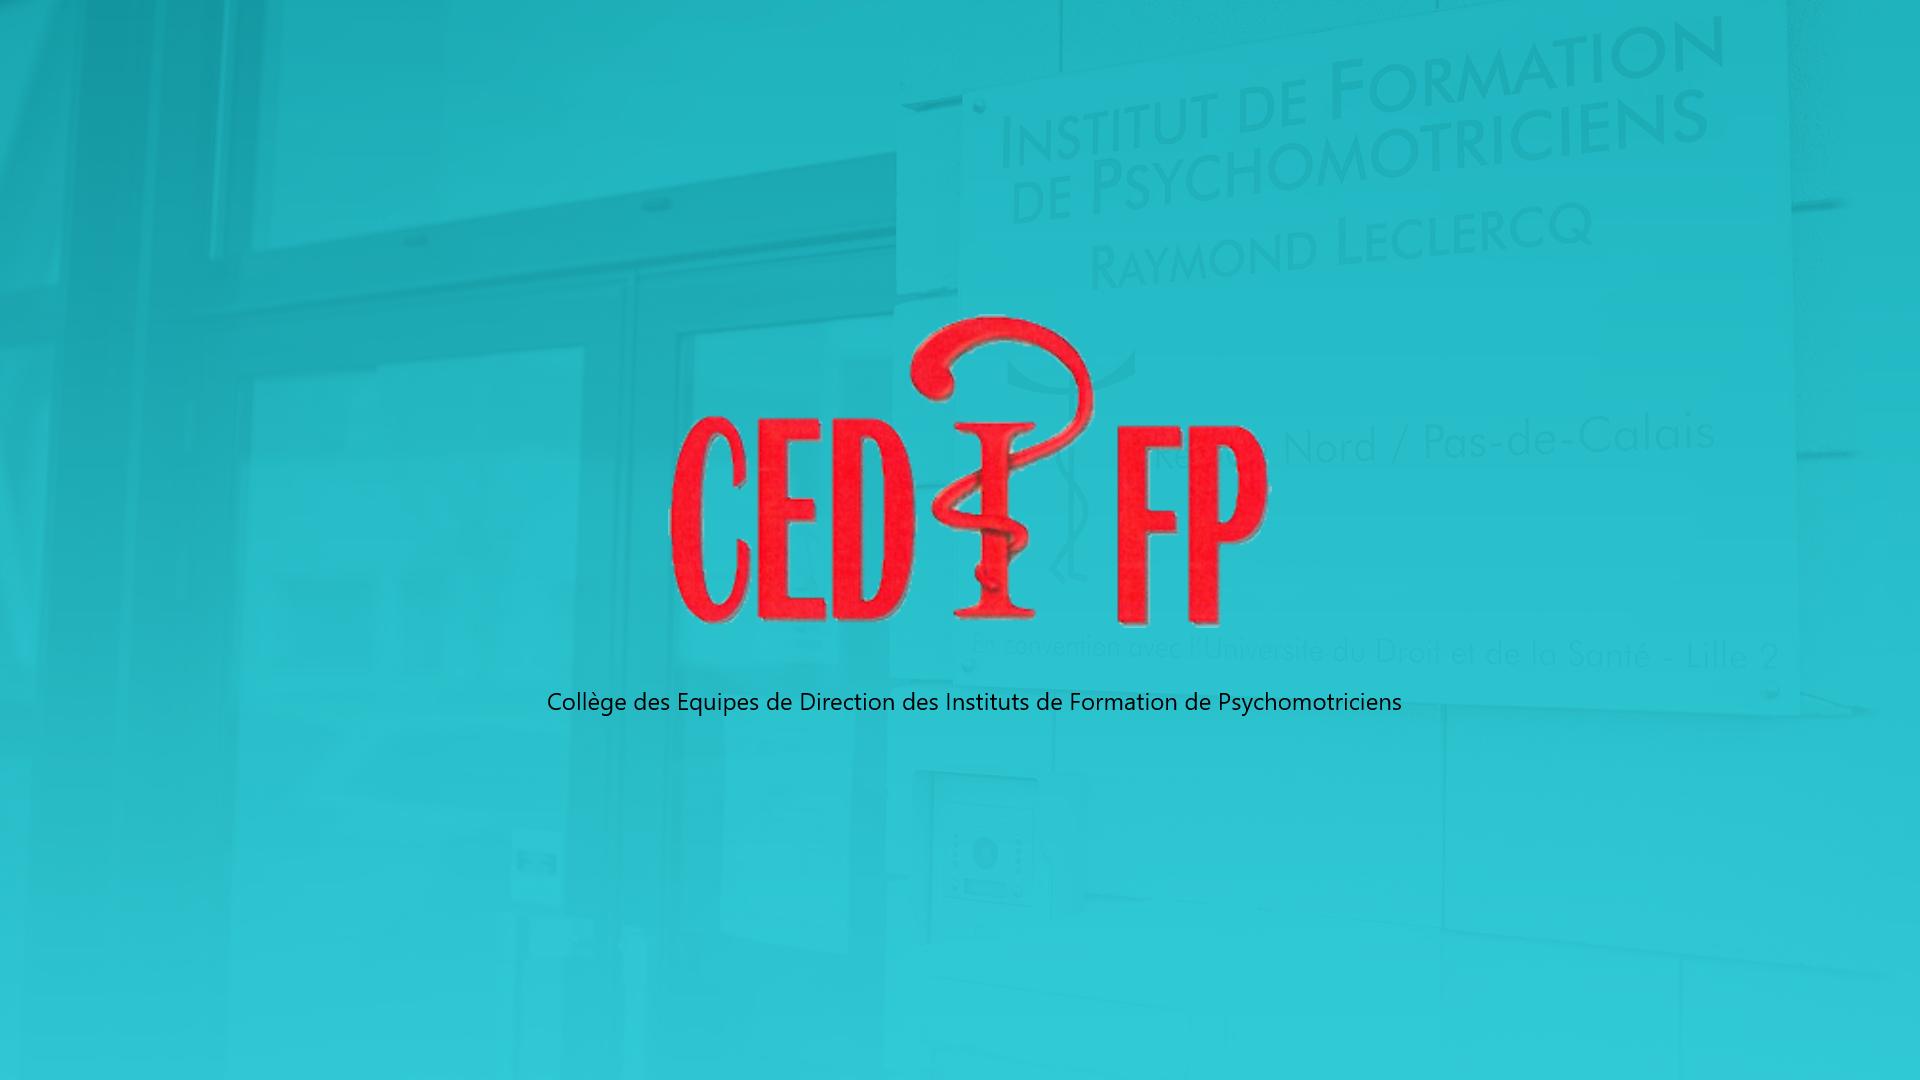 CEDIFP